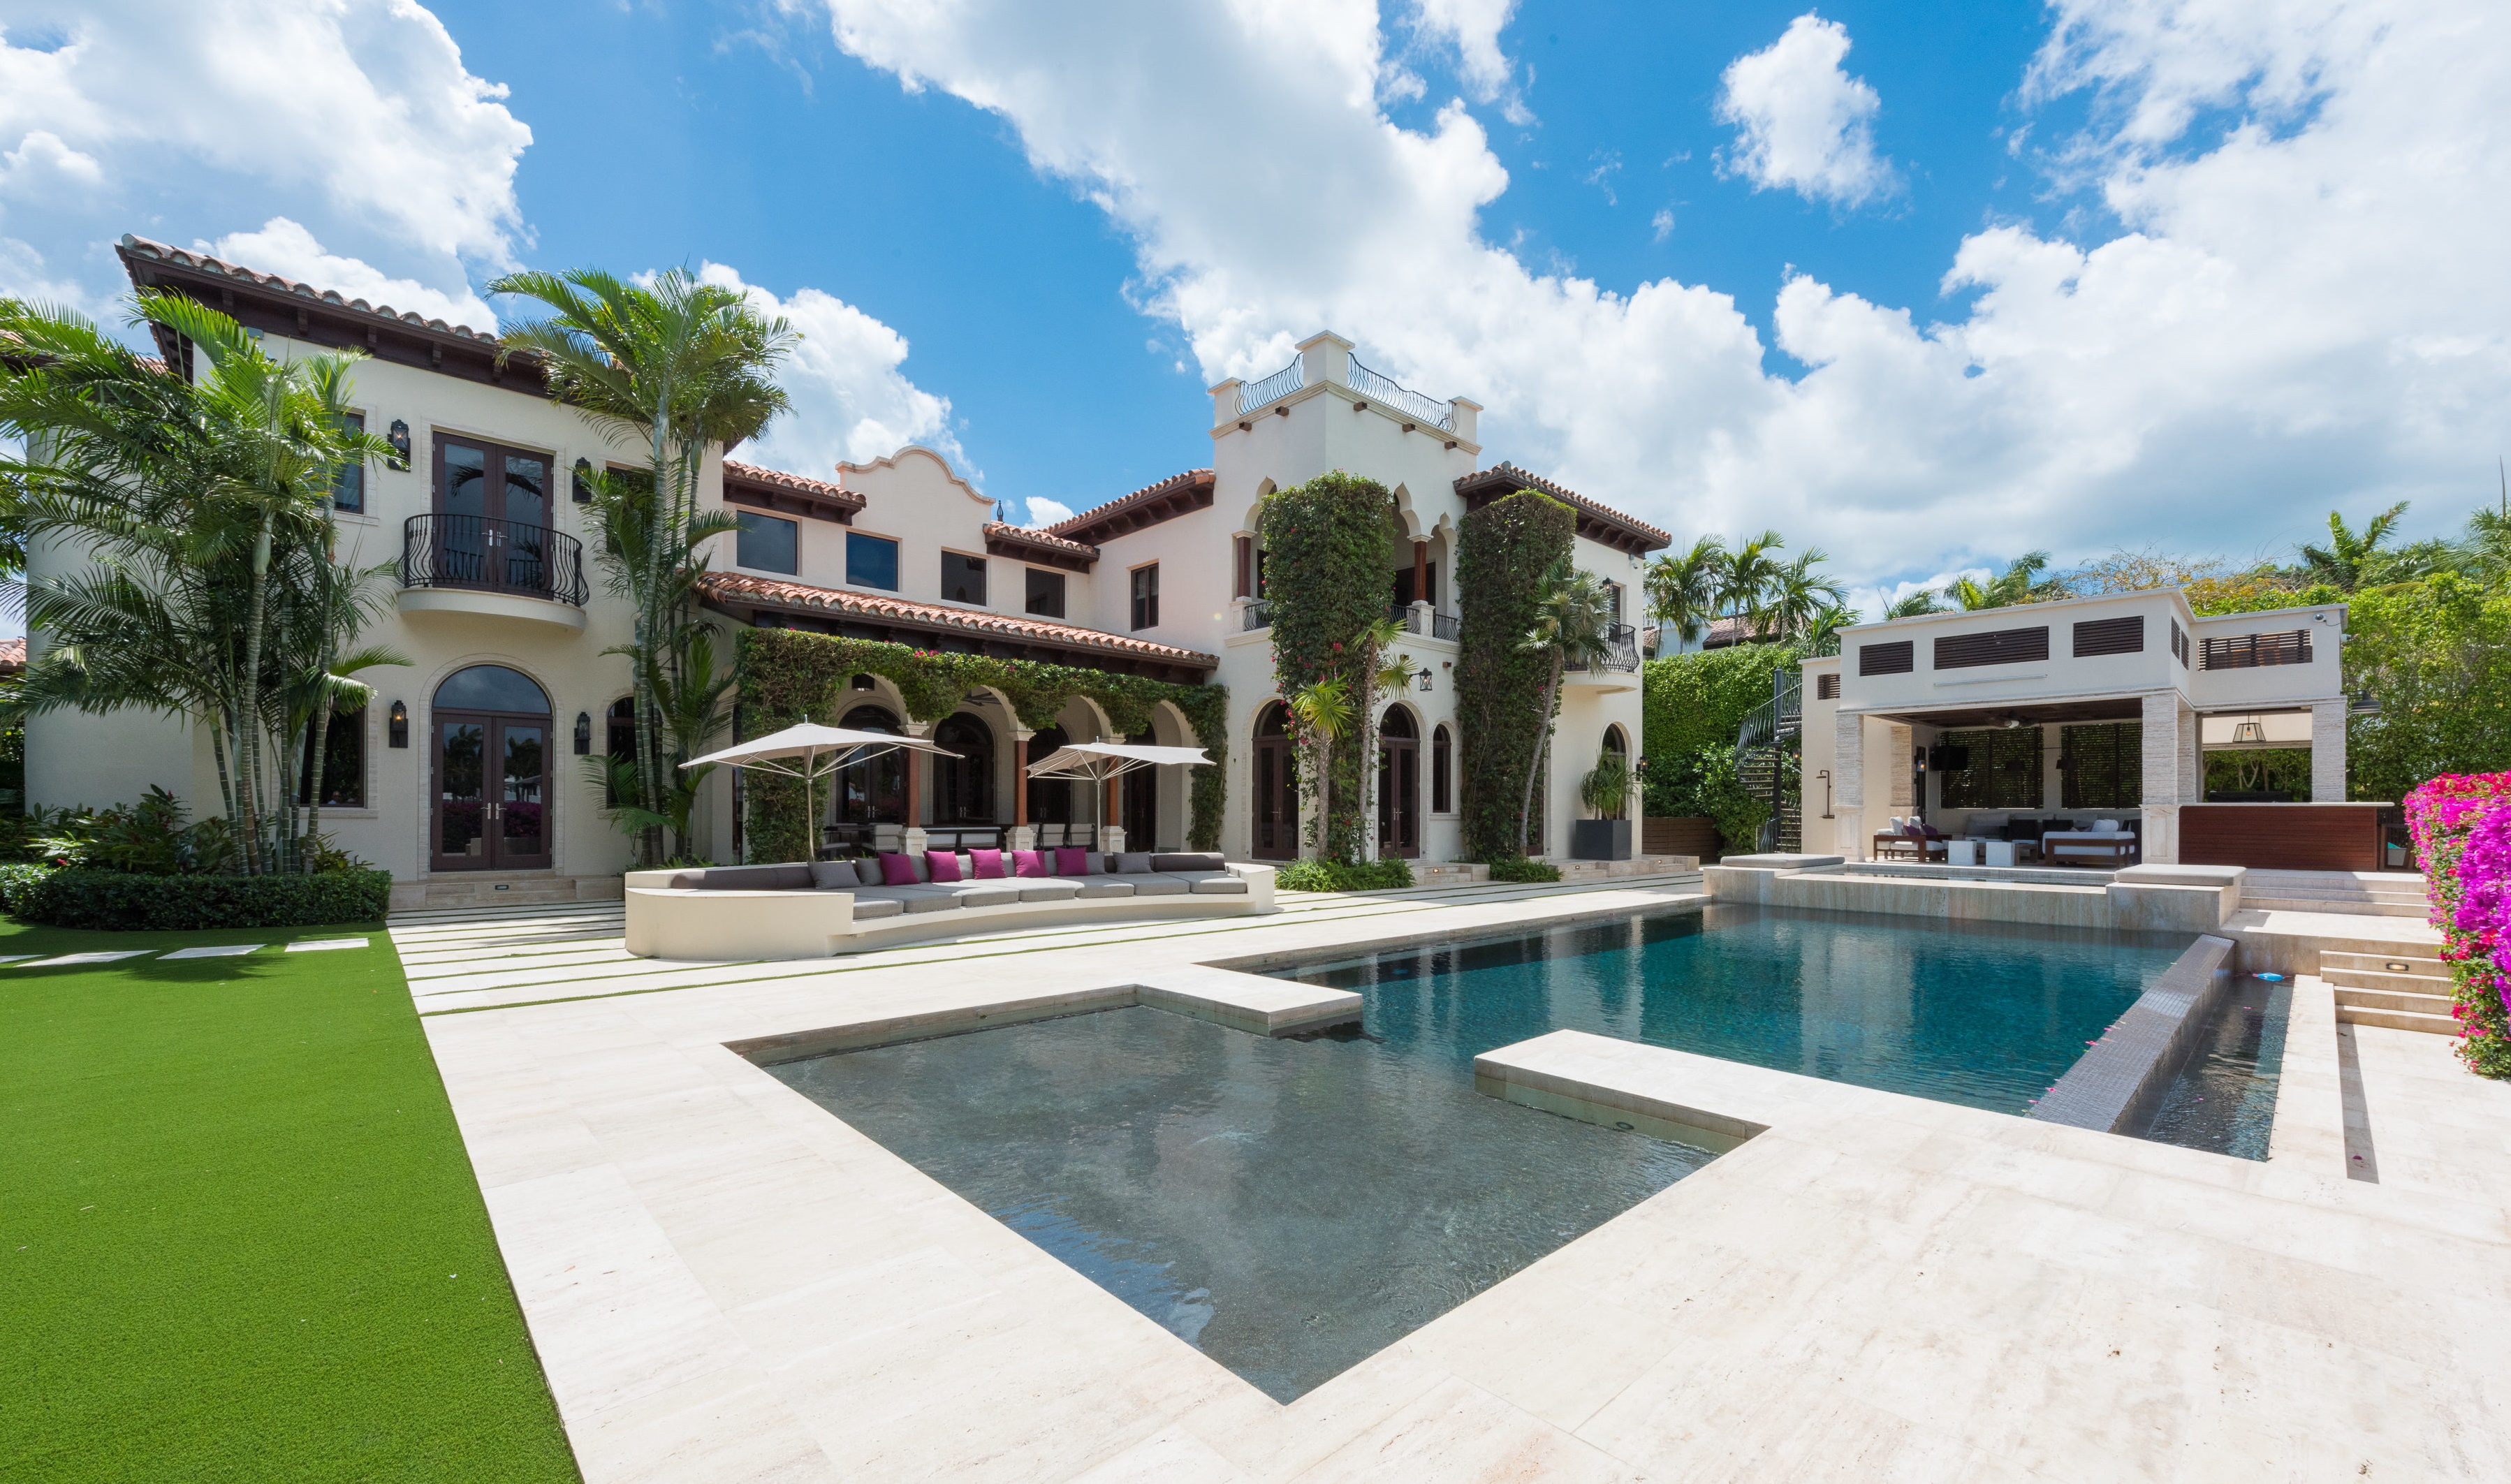 Backyard view of a massive Mediterranean mansion in Miami Beach